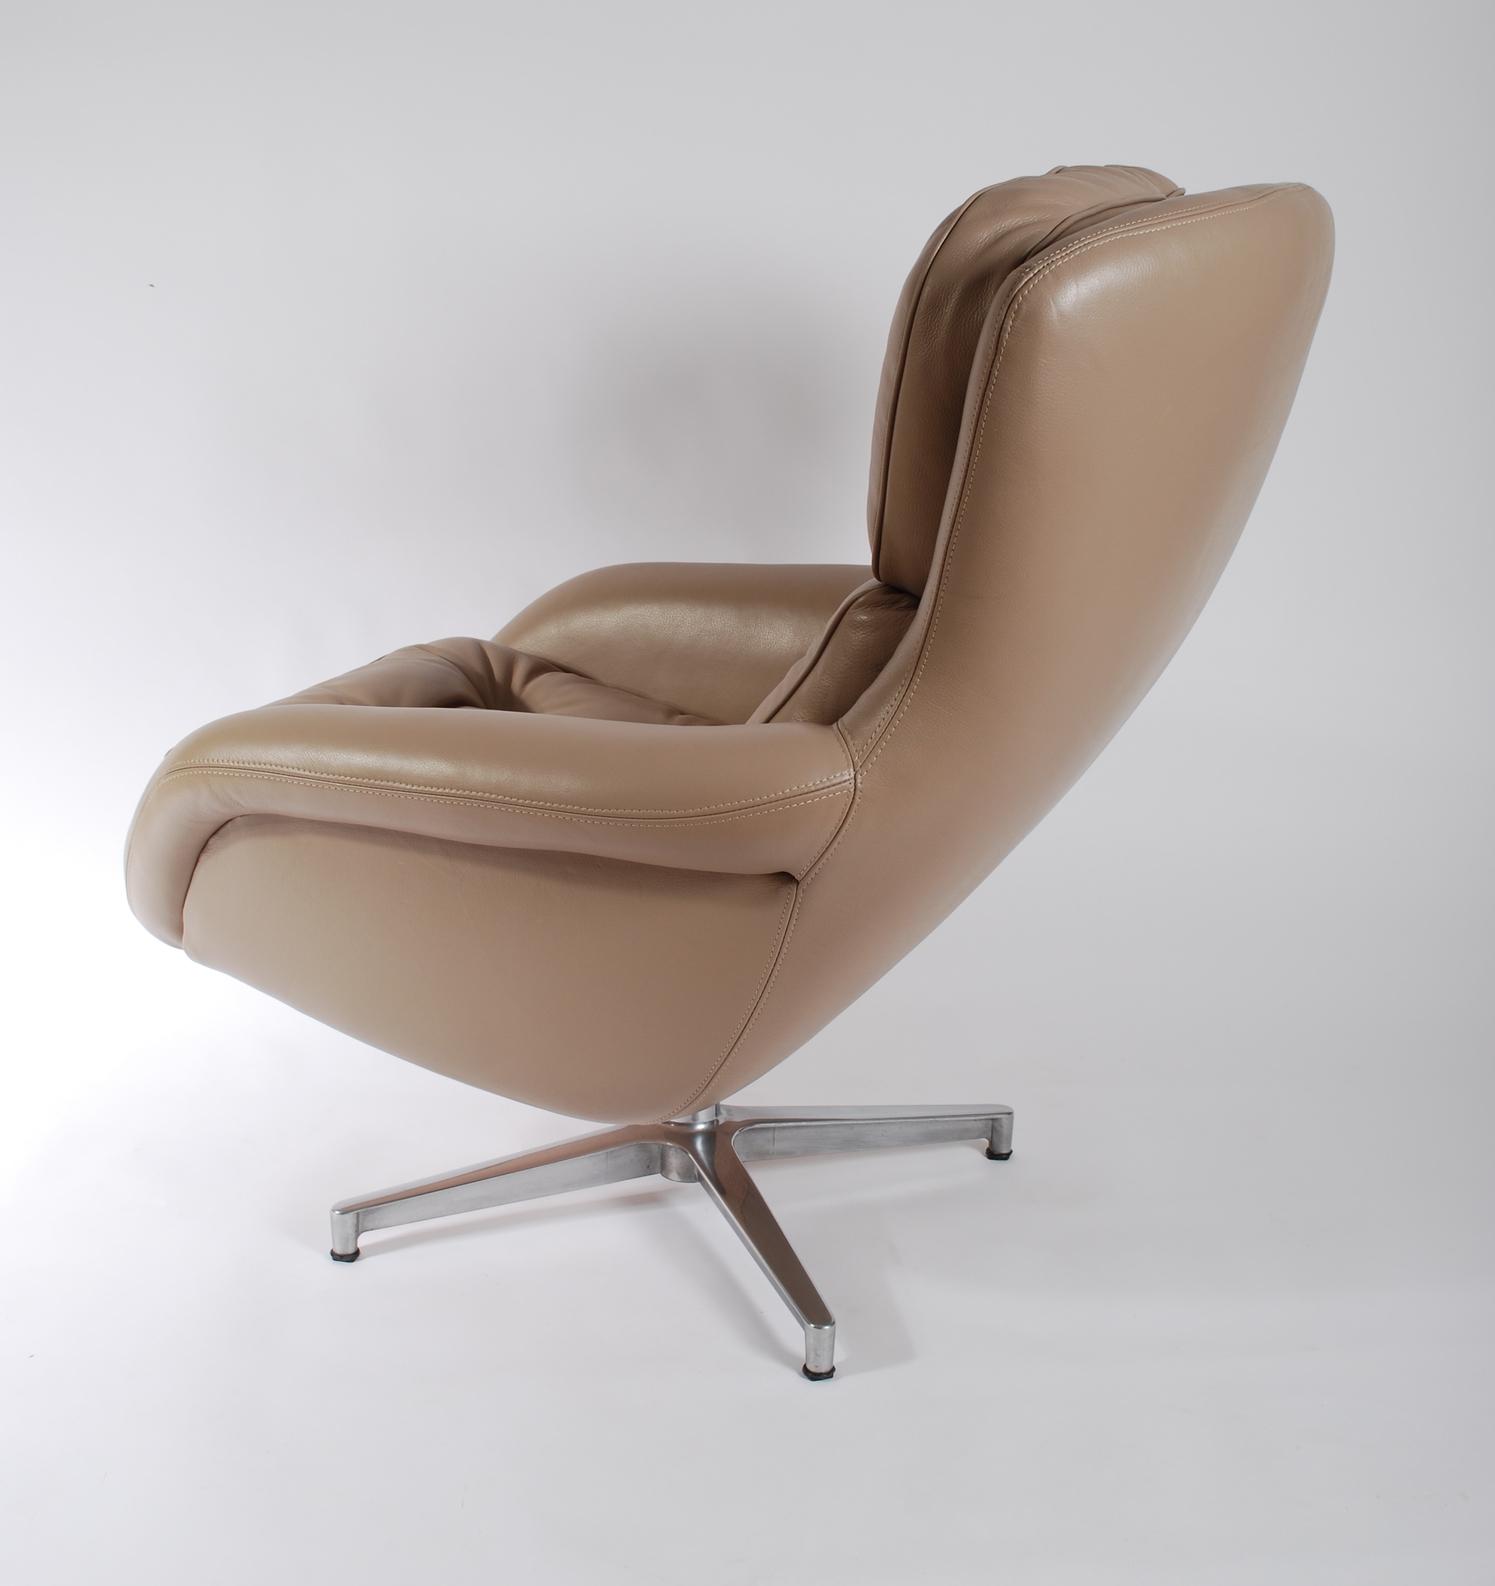 Lounge Swivel Chair 60's, camel/grey leather, chrome leg